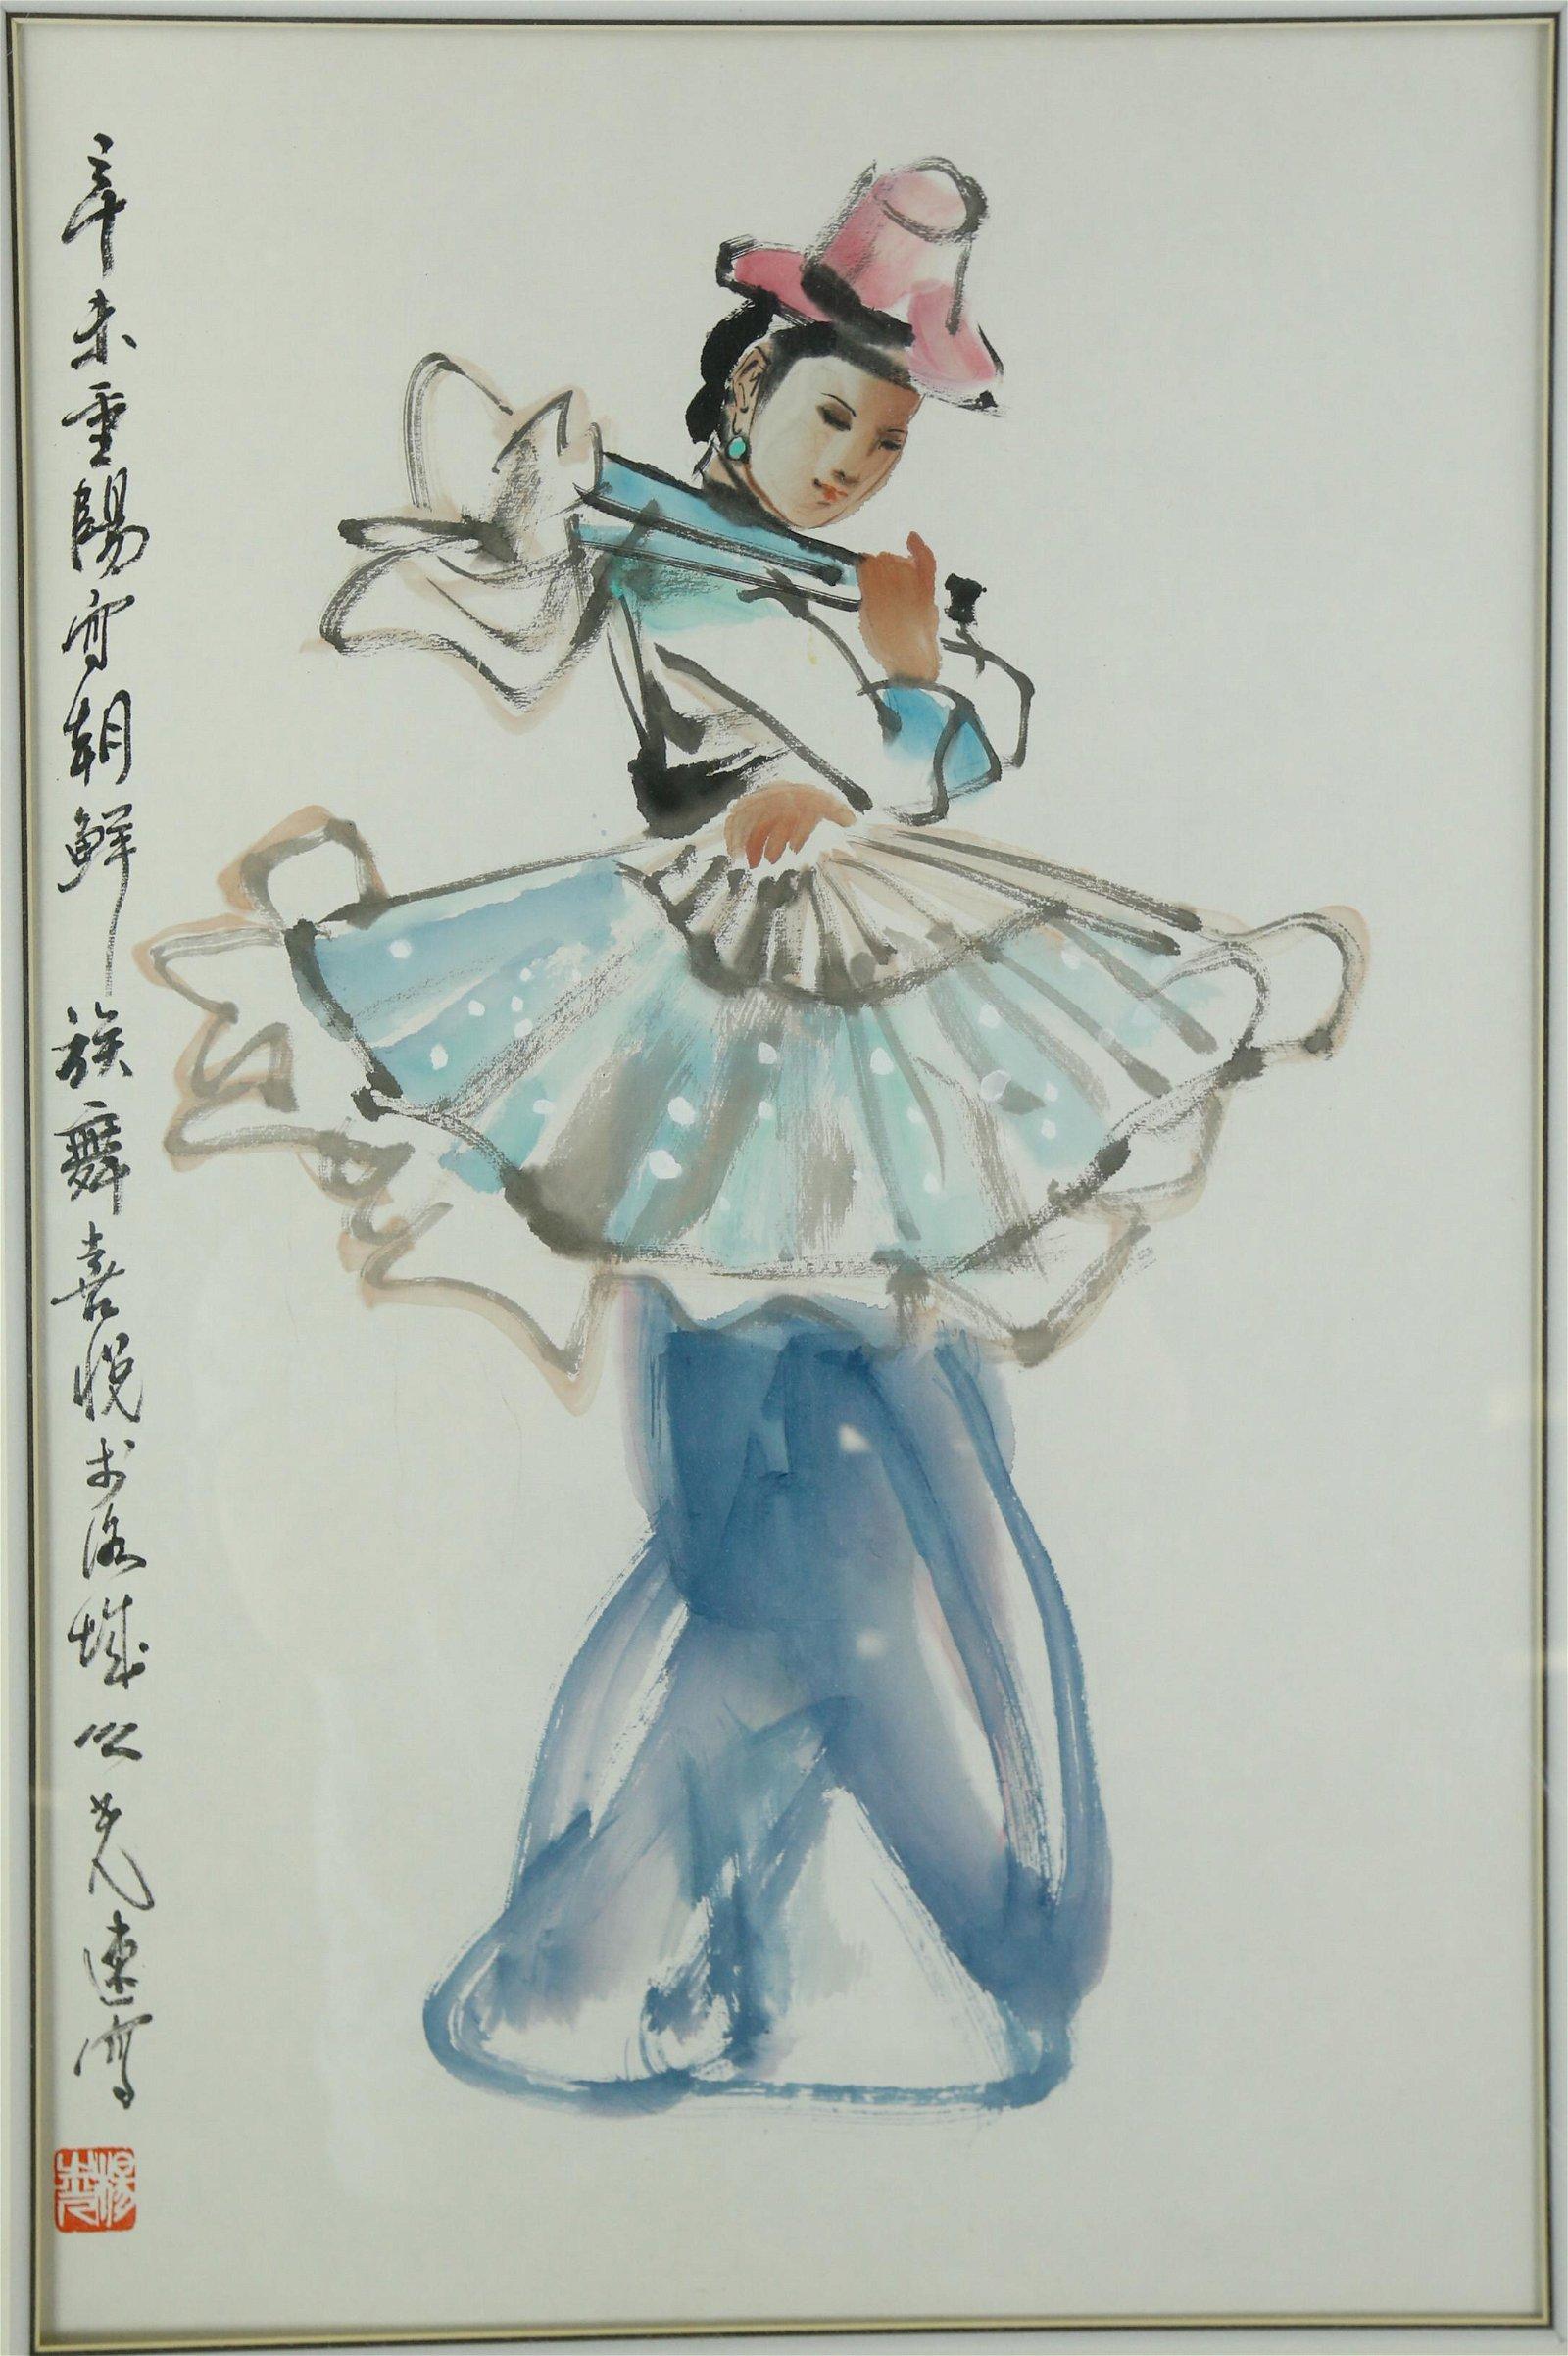 Yang Zhiguang b. 1930 Watercolour on Paper Framed